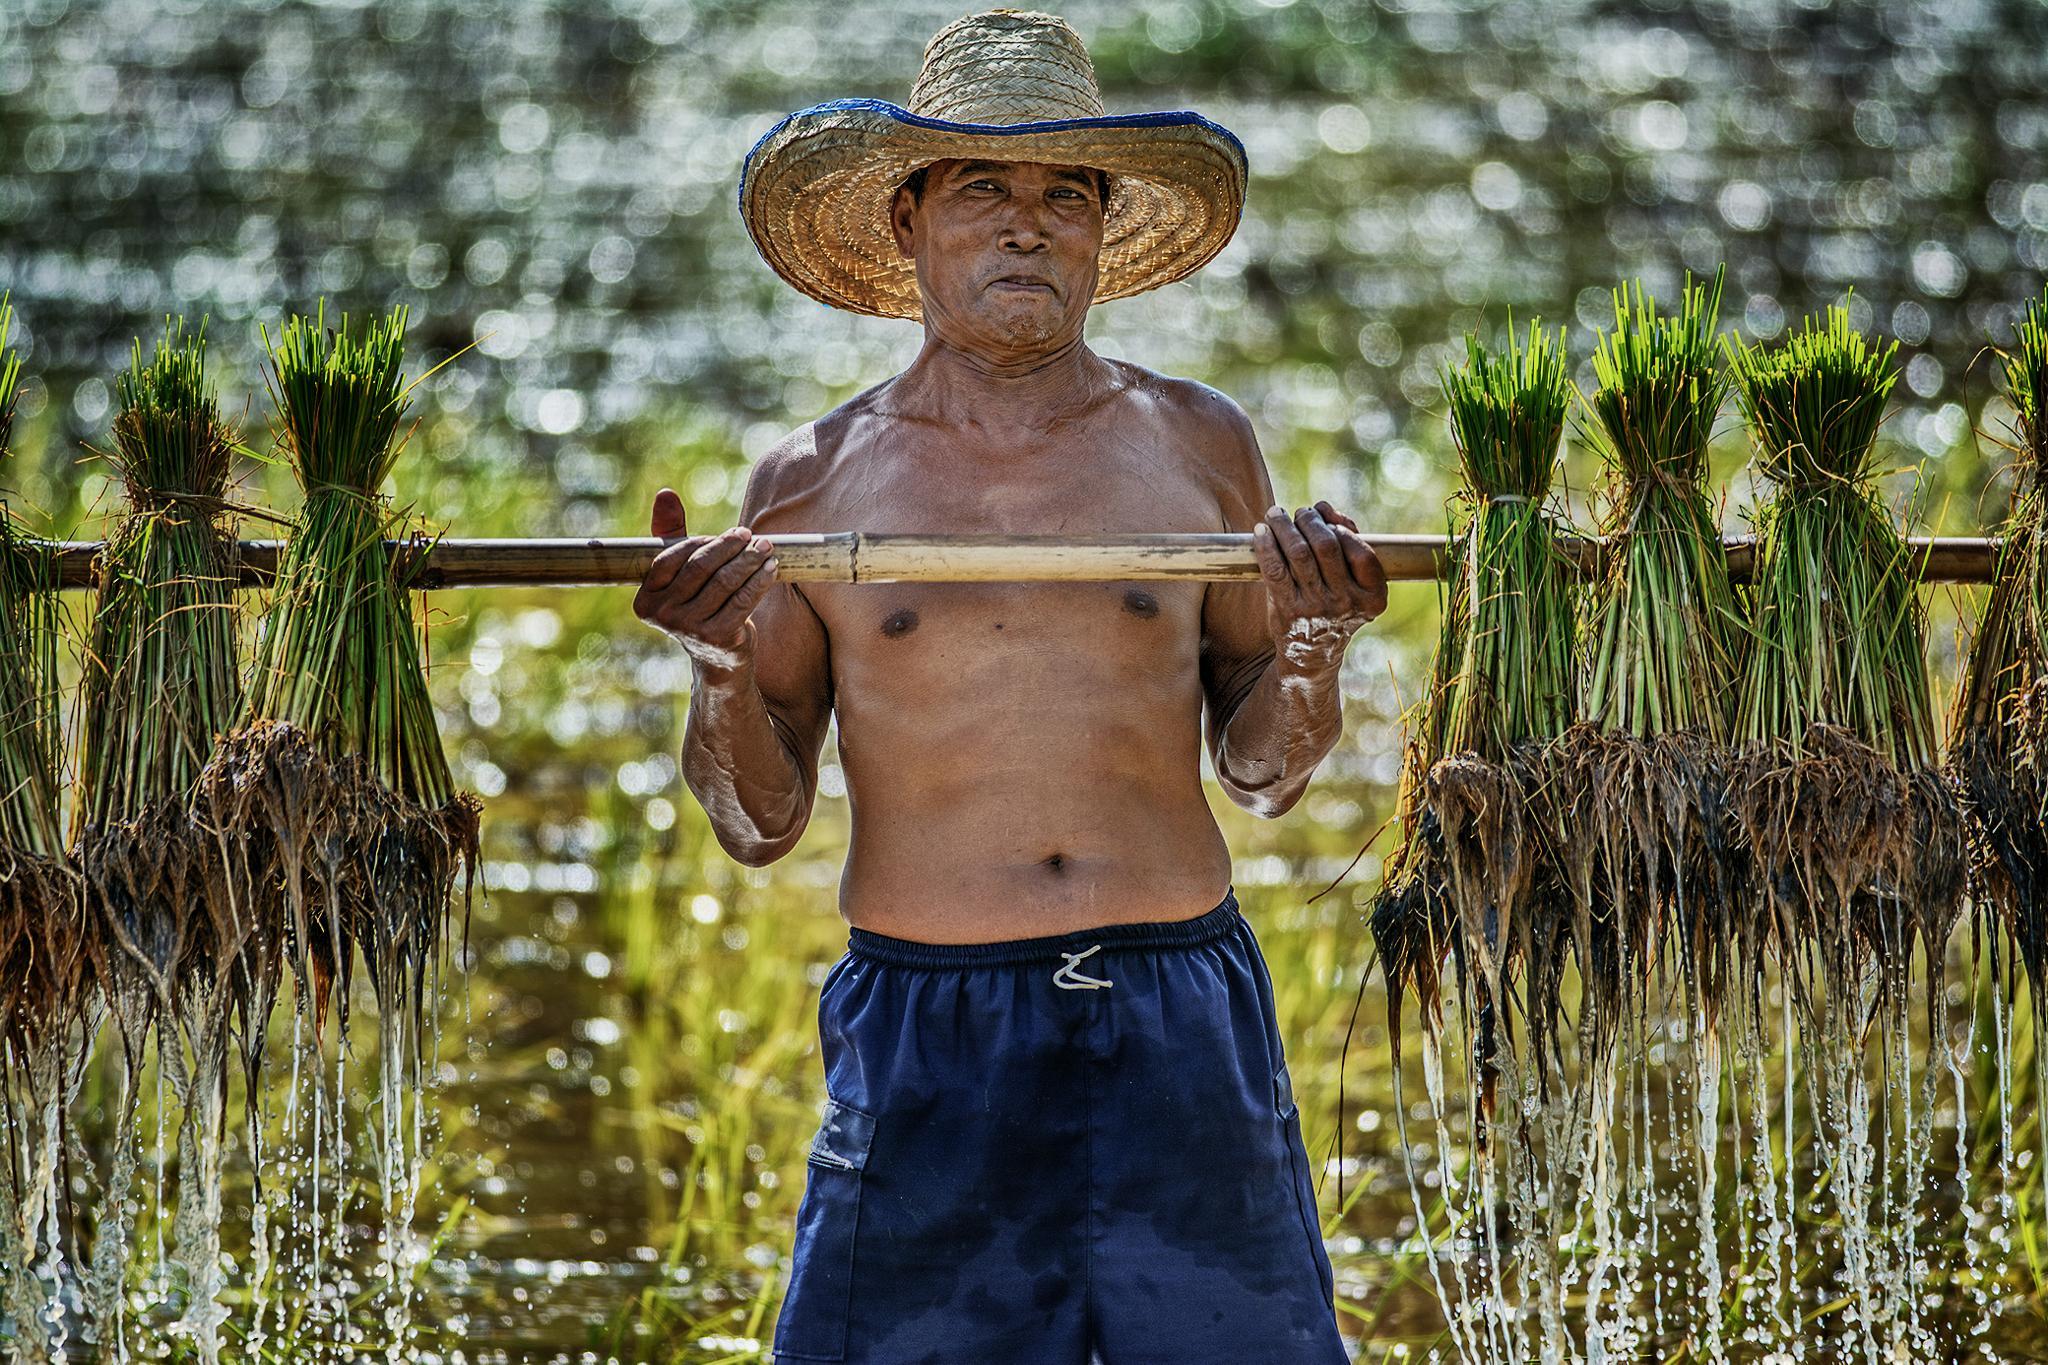 Weightlifter Farmer by Ratchakit Kannika